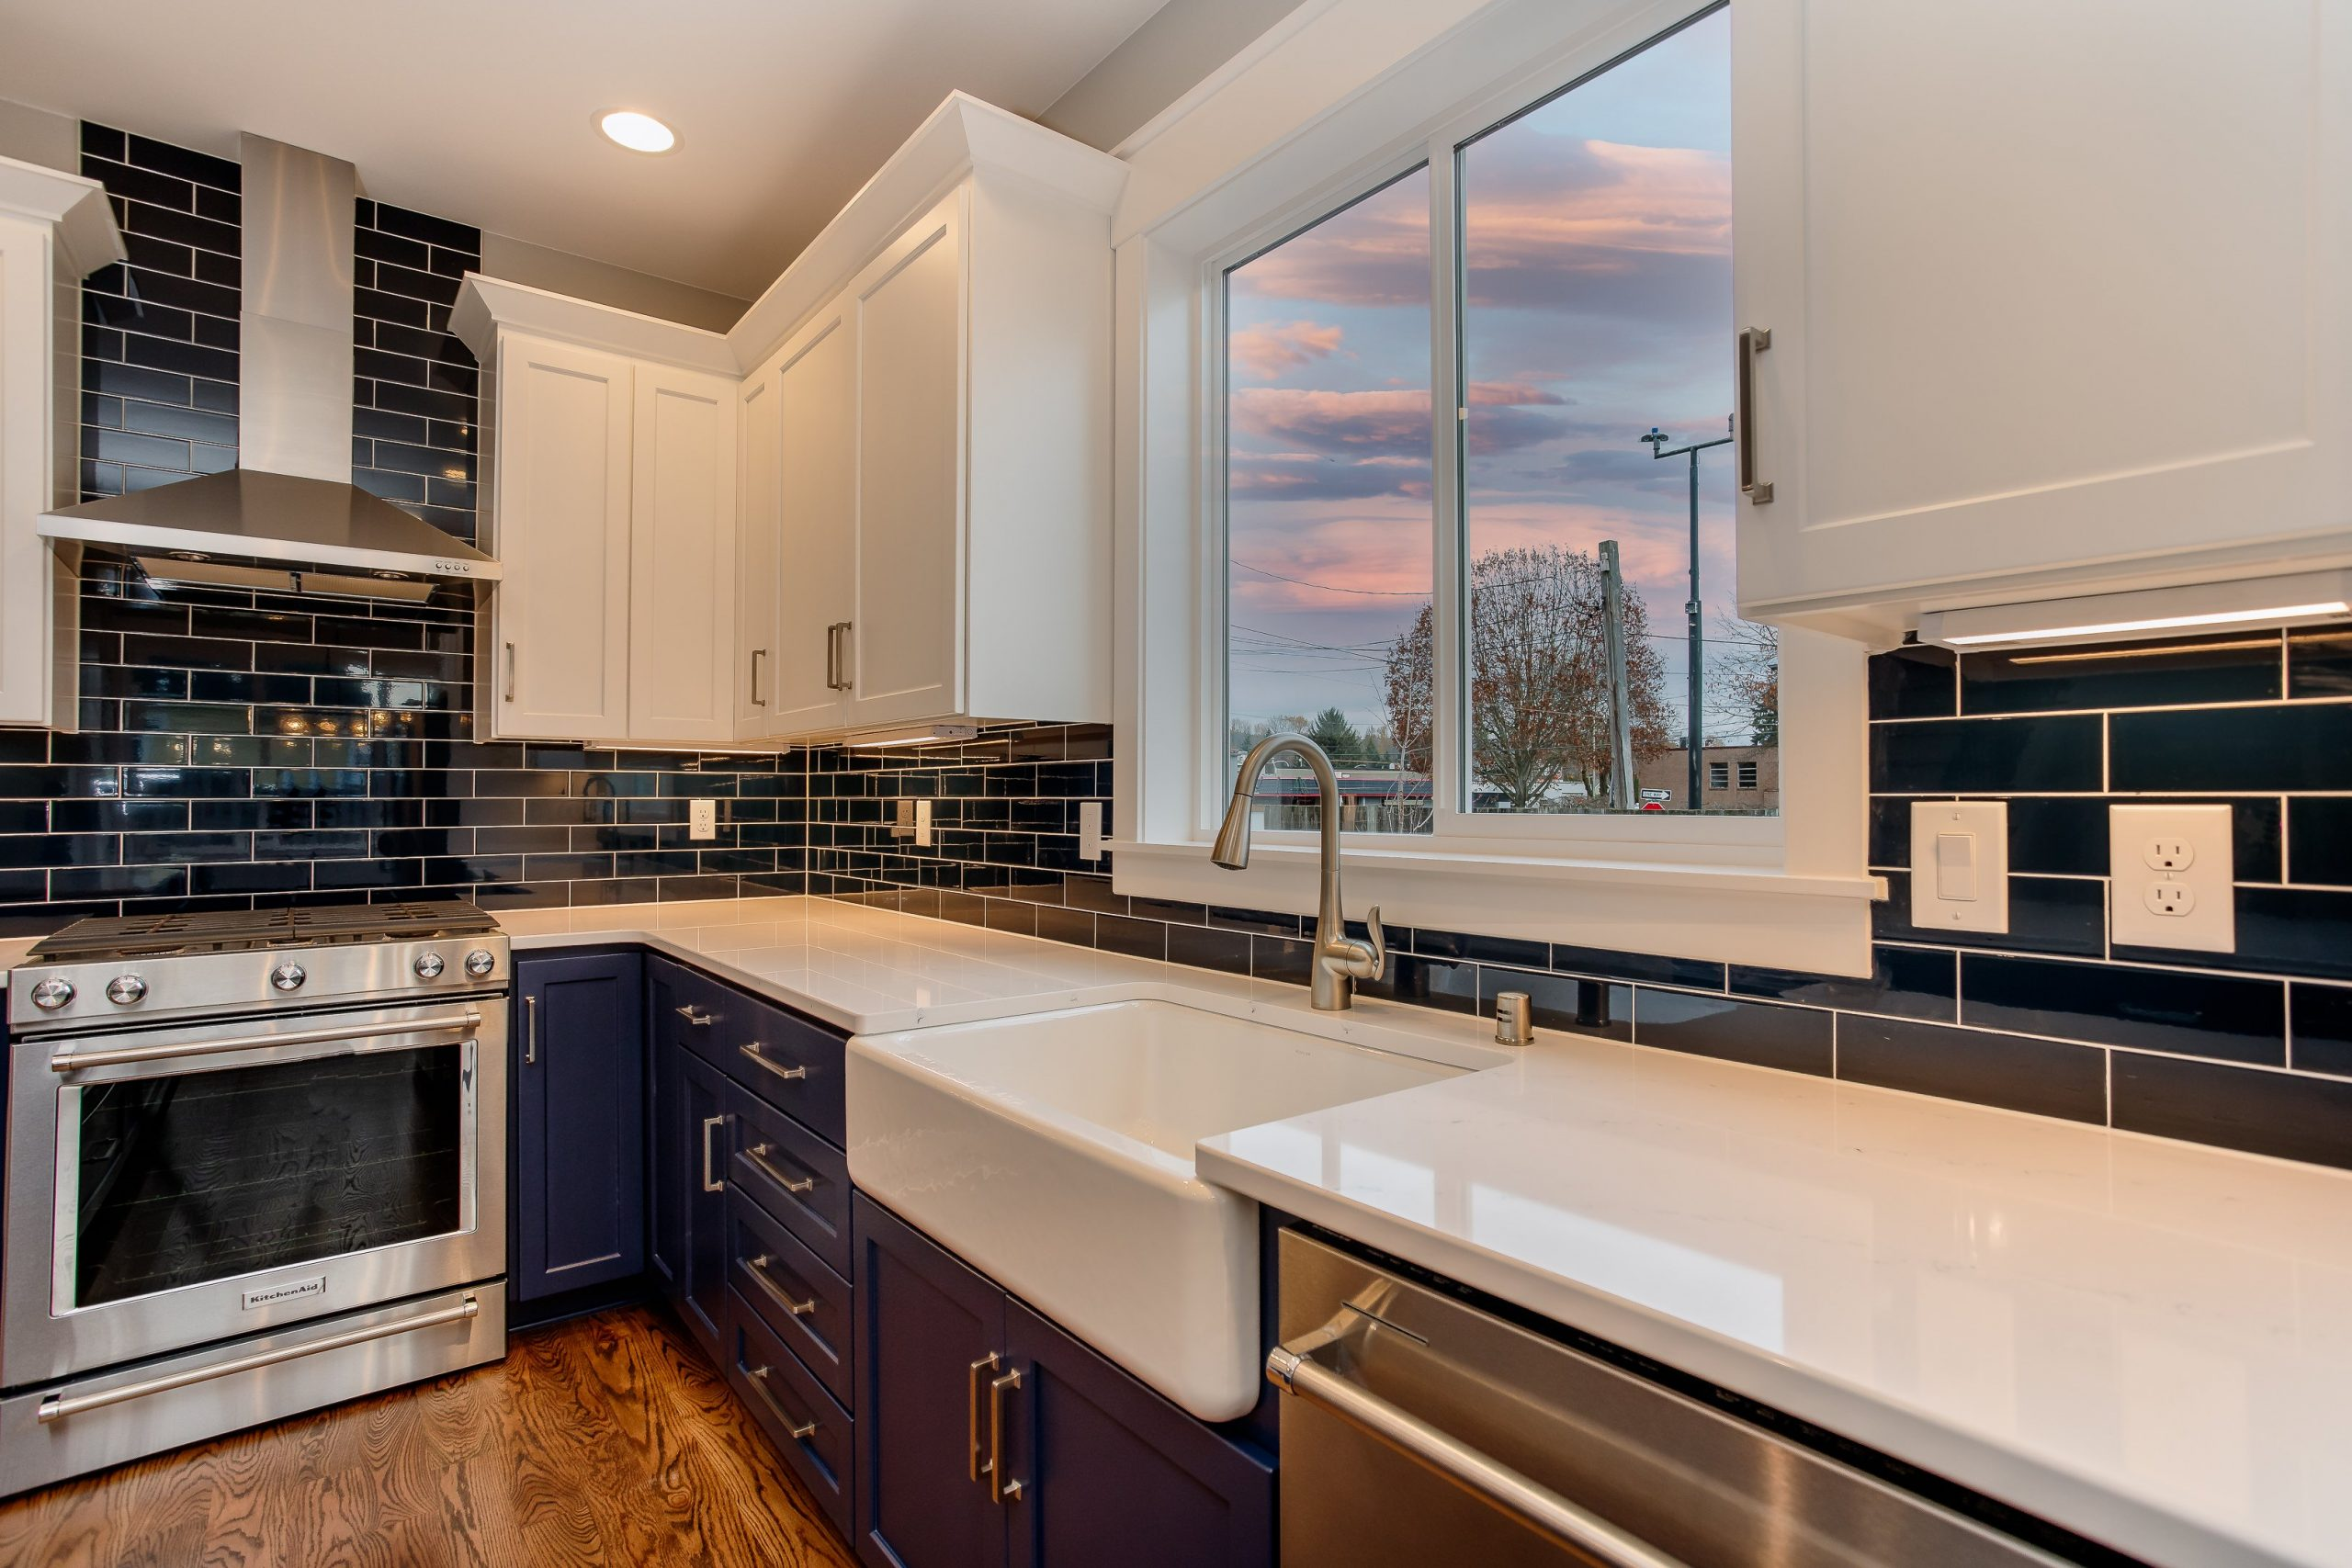 11 kitchen scaled